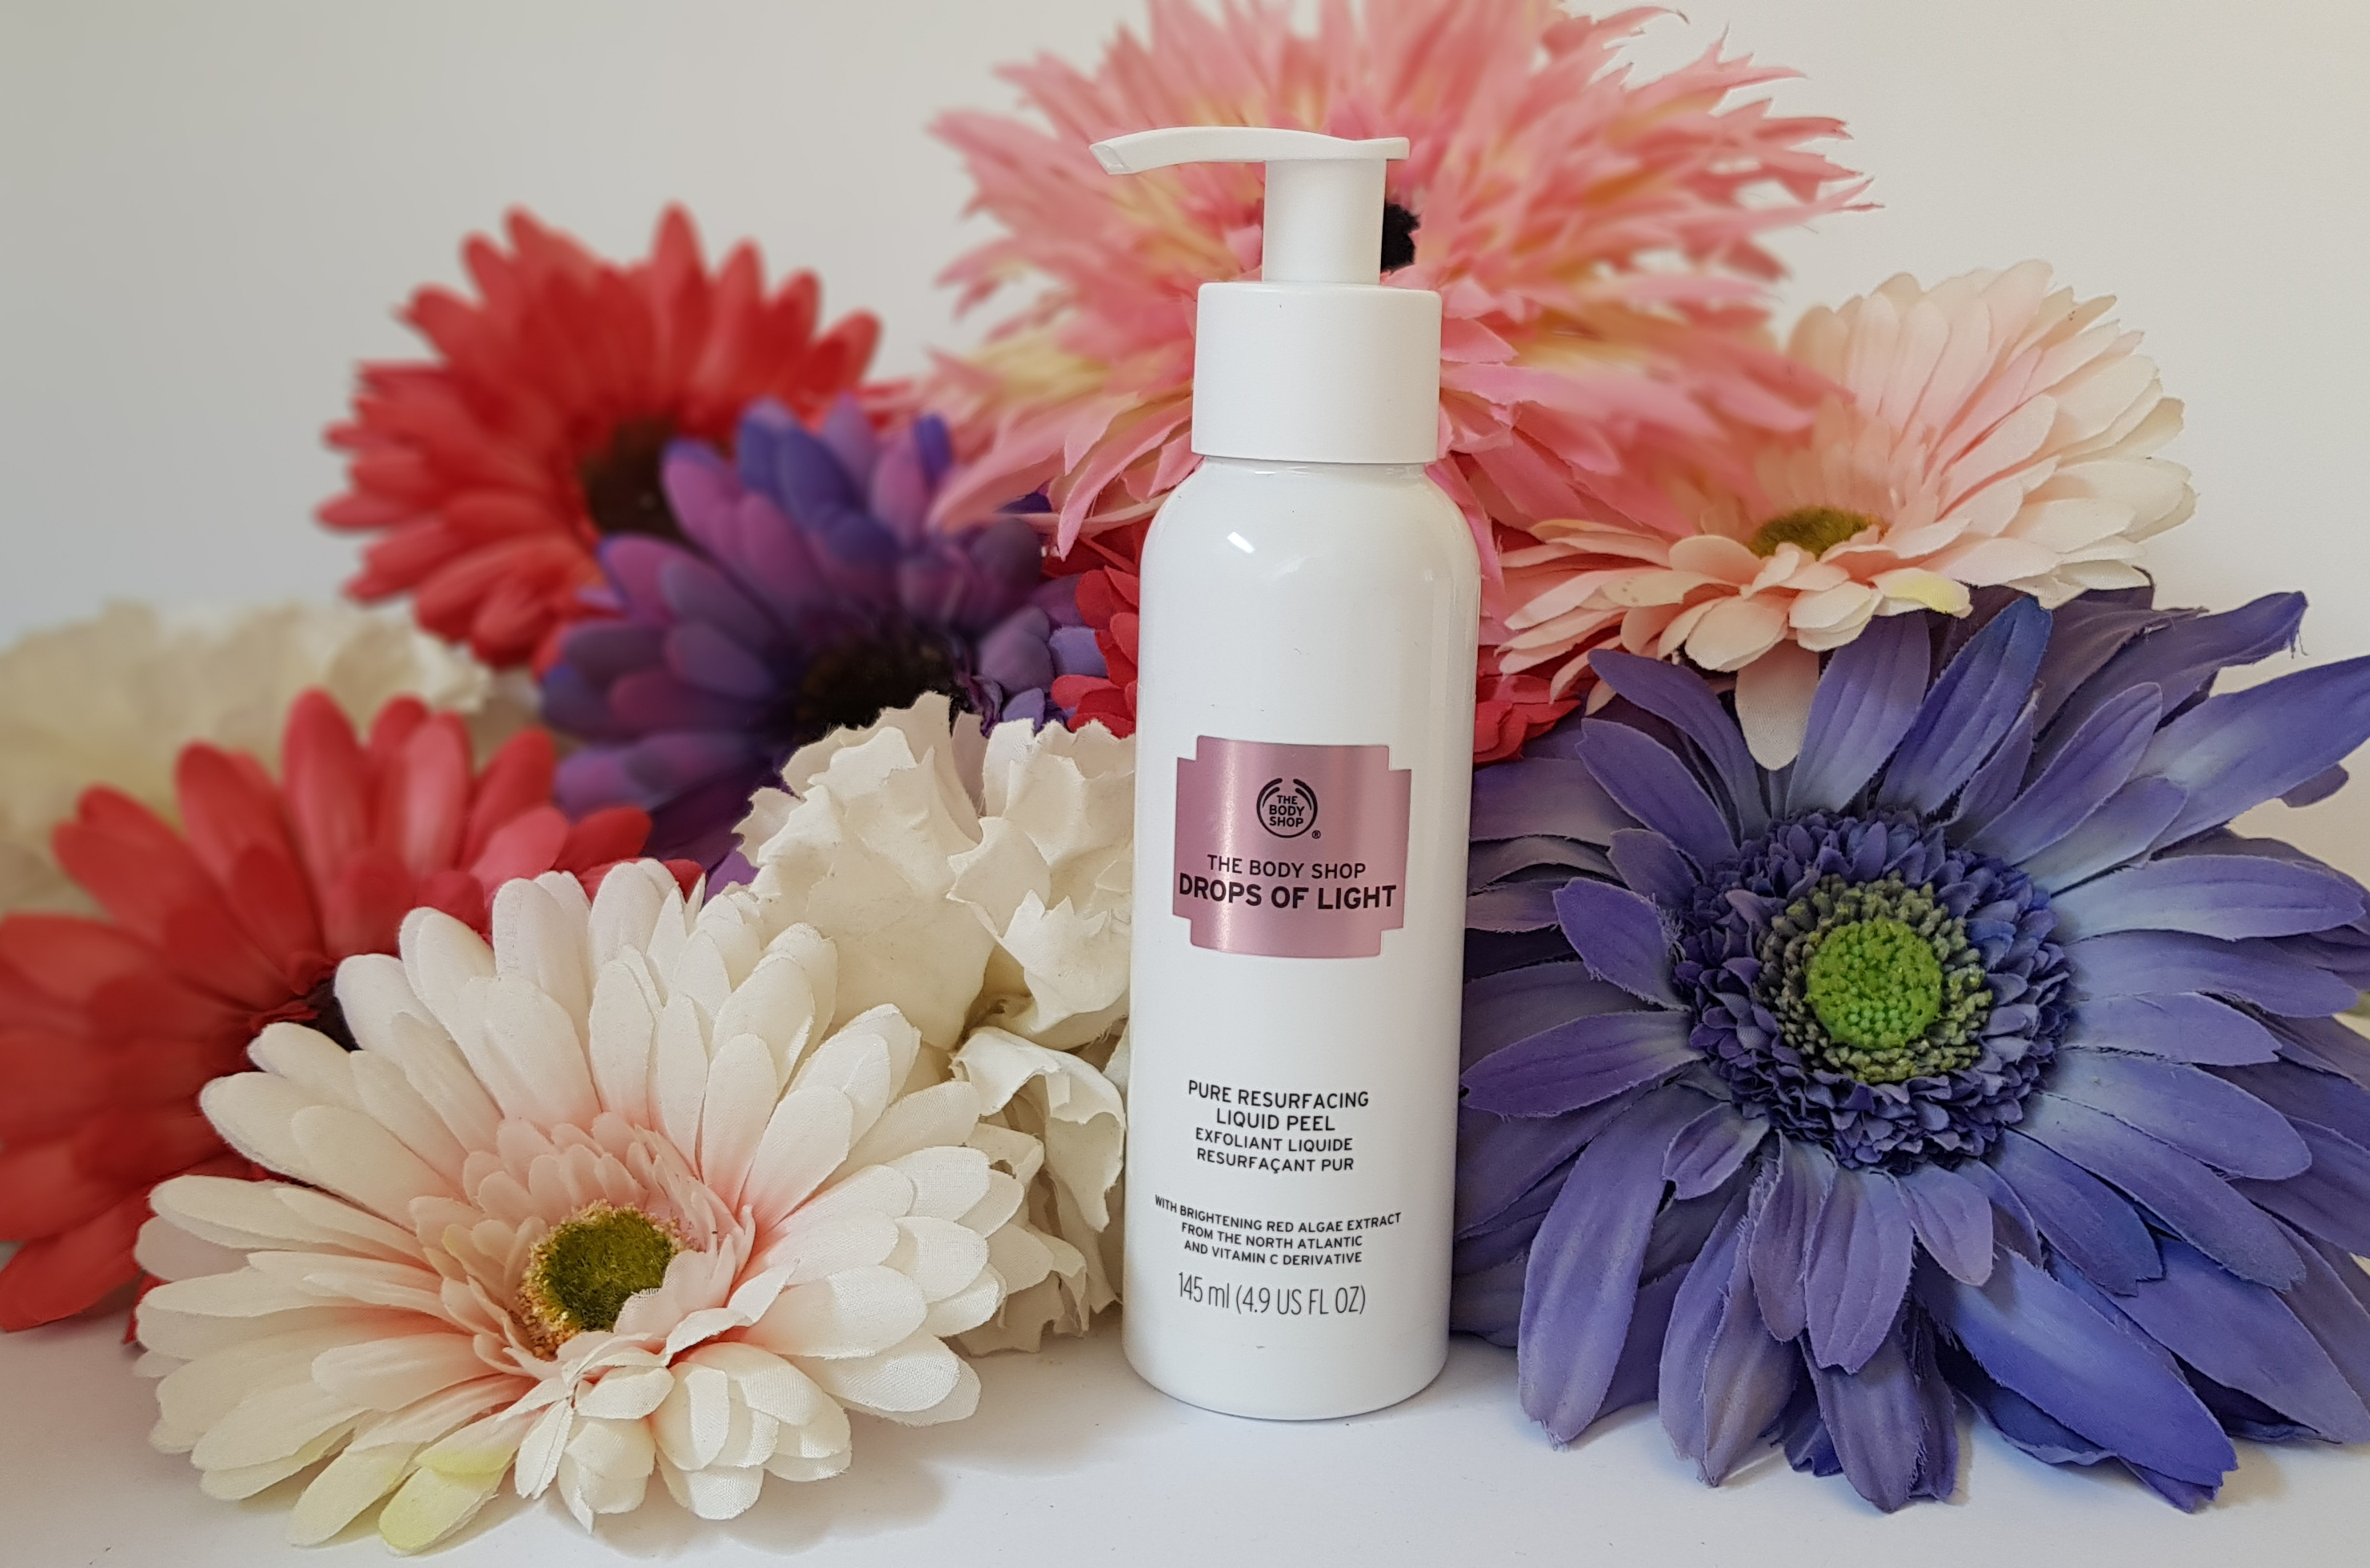 The Body Shop: Drops of Light Pure Resurfacing Liquid Peel Review